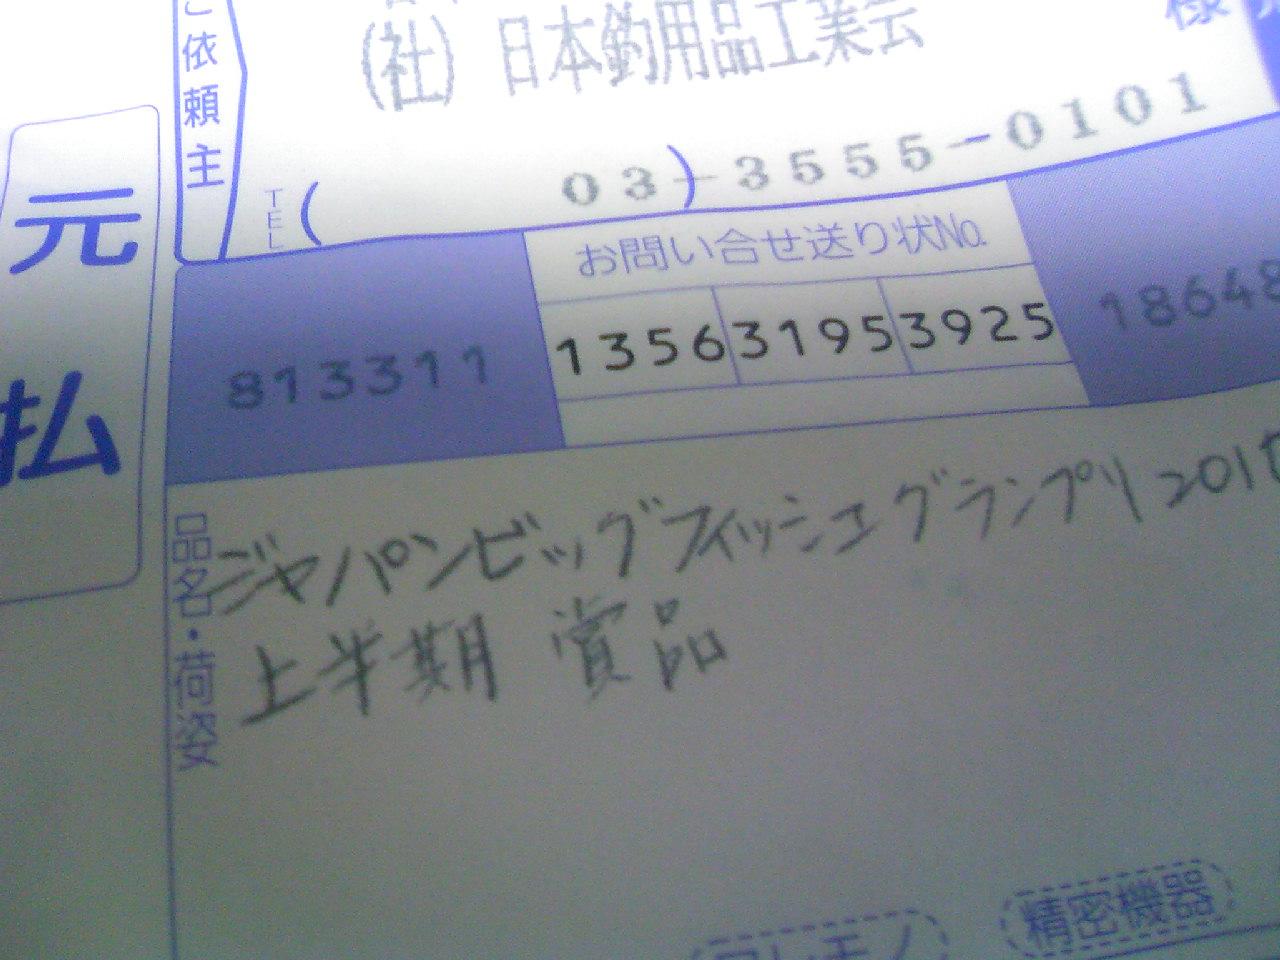 Dcf_7903